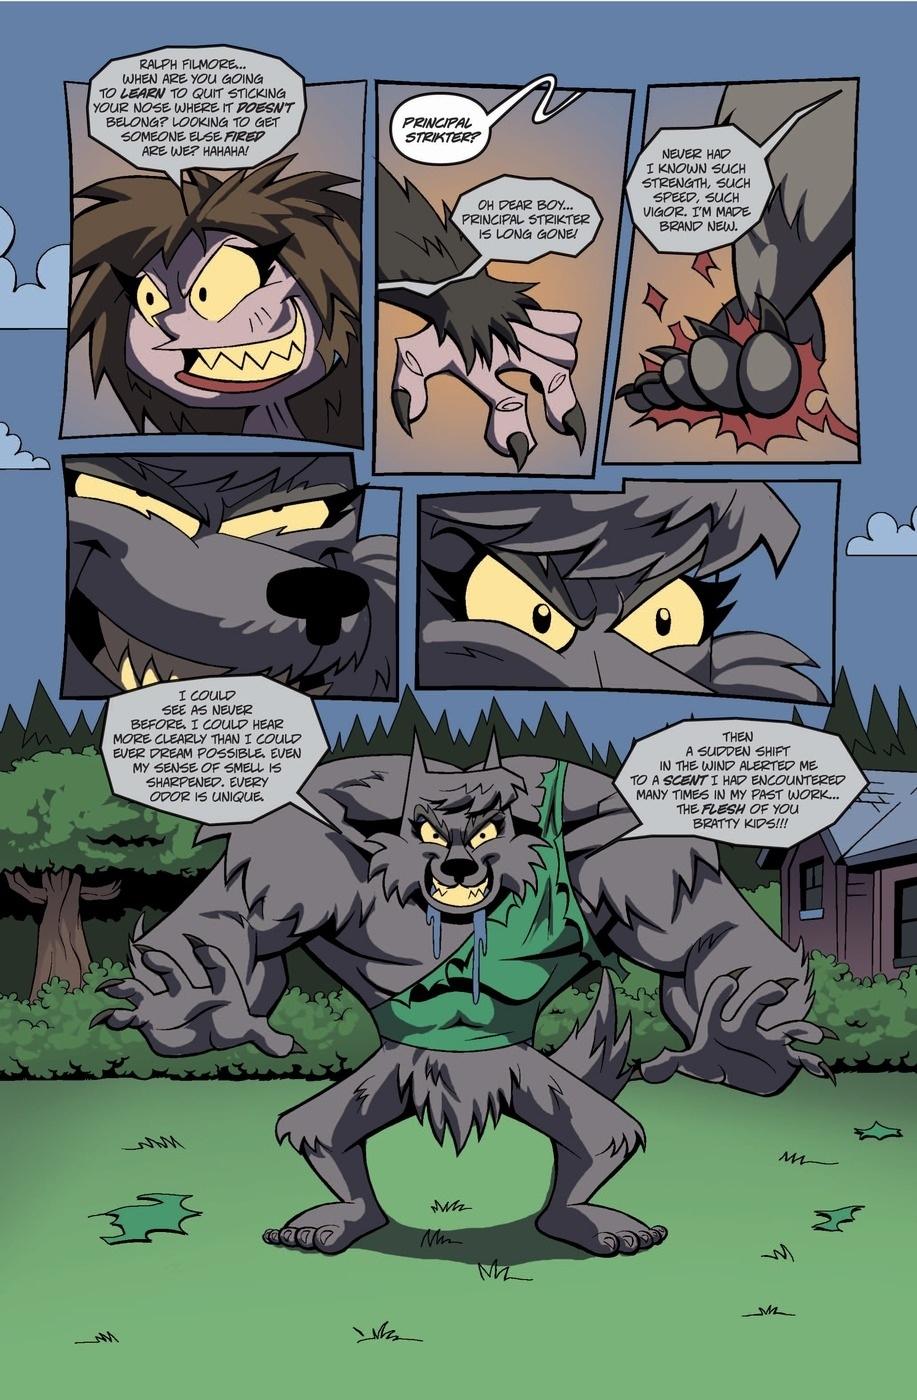 Read online Ralph Filmore comic -  Issue # Full - 95